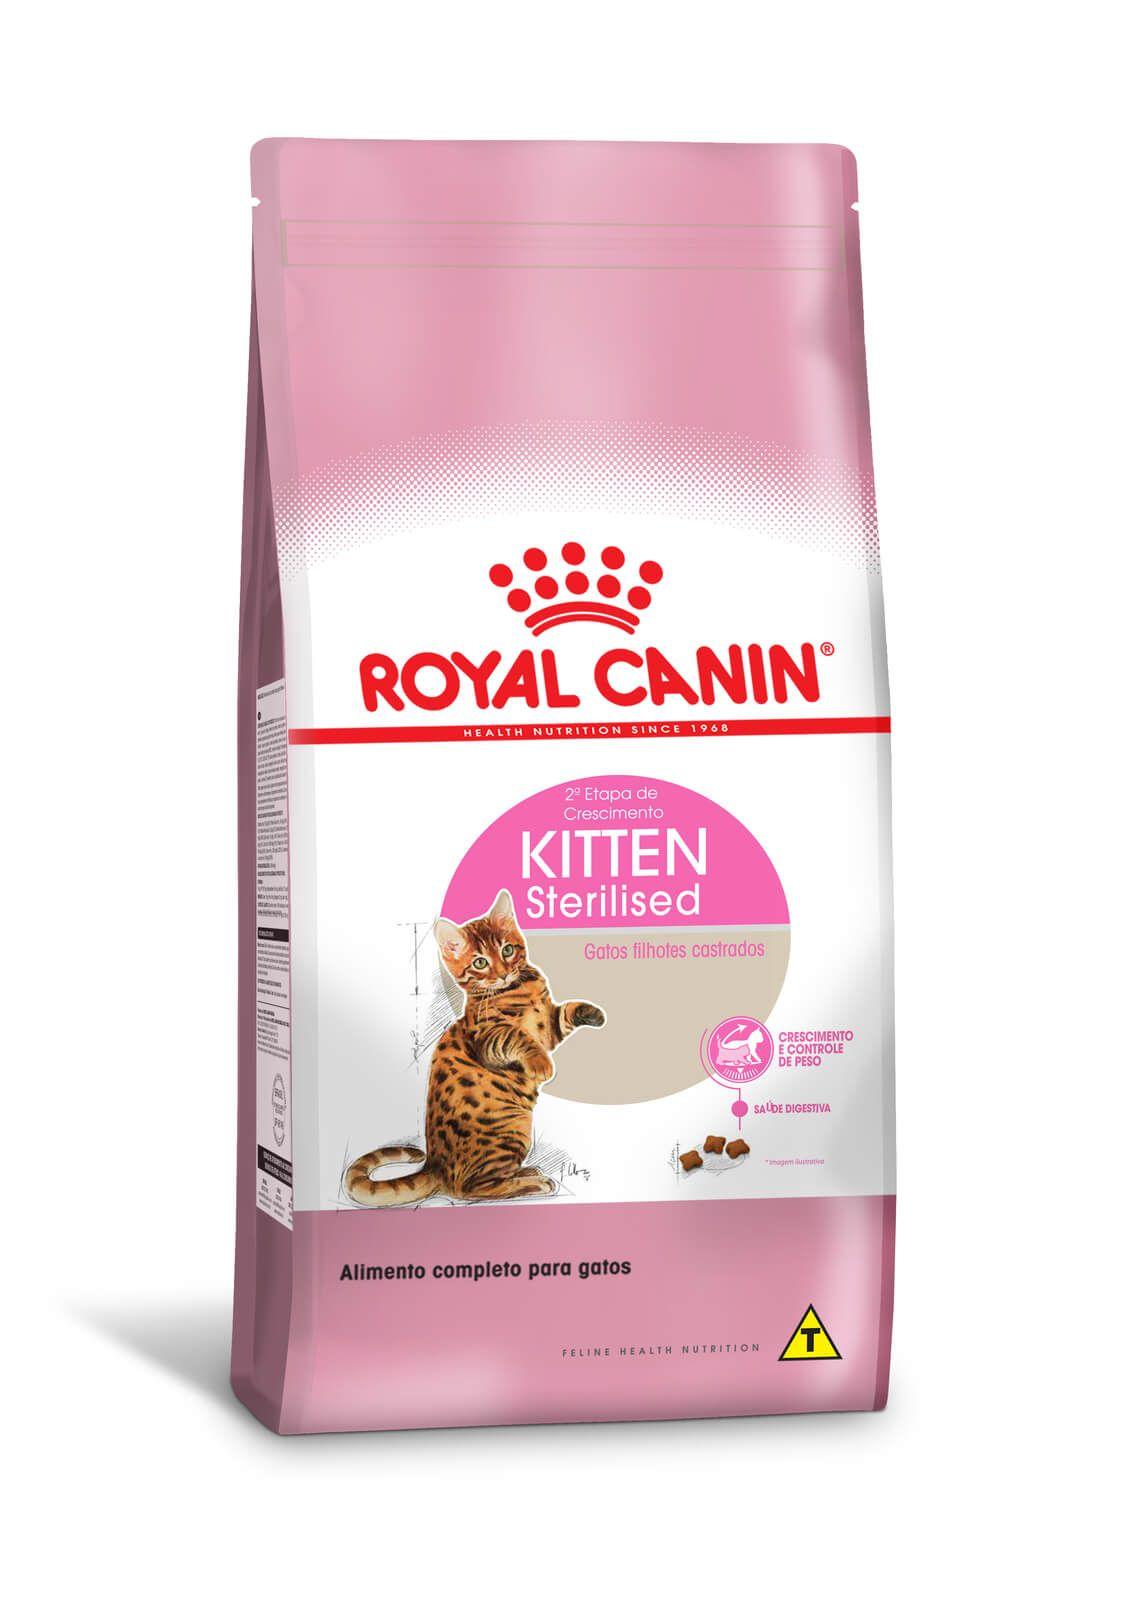 Ração Royal Canin Kitten Sterilised - Gatos filhotes castrados